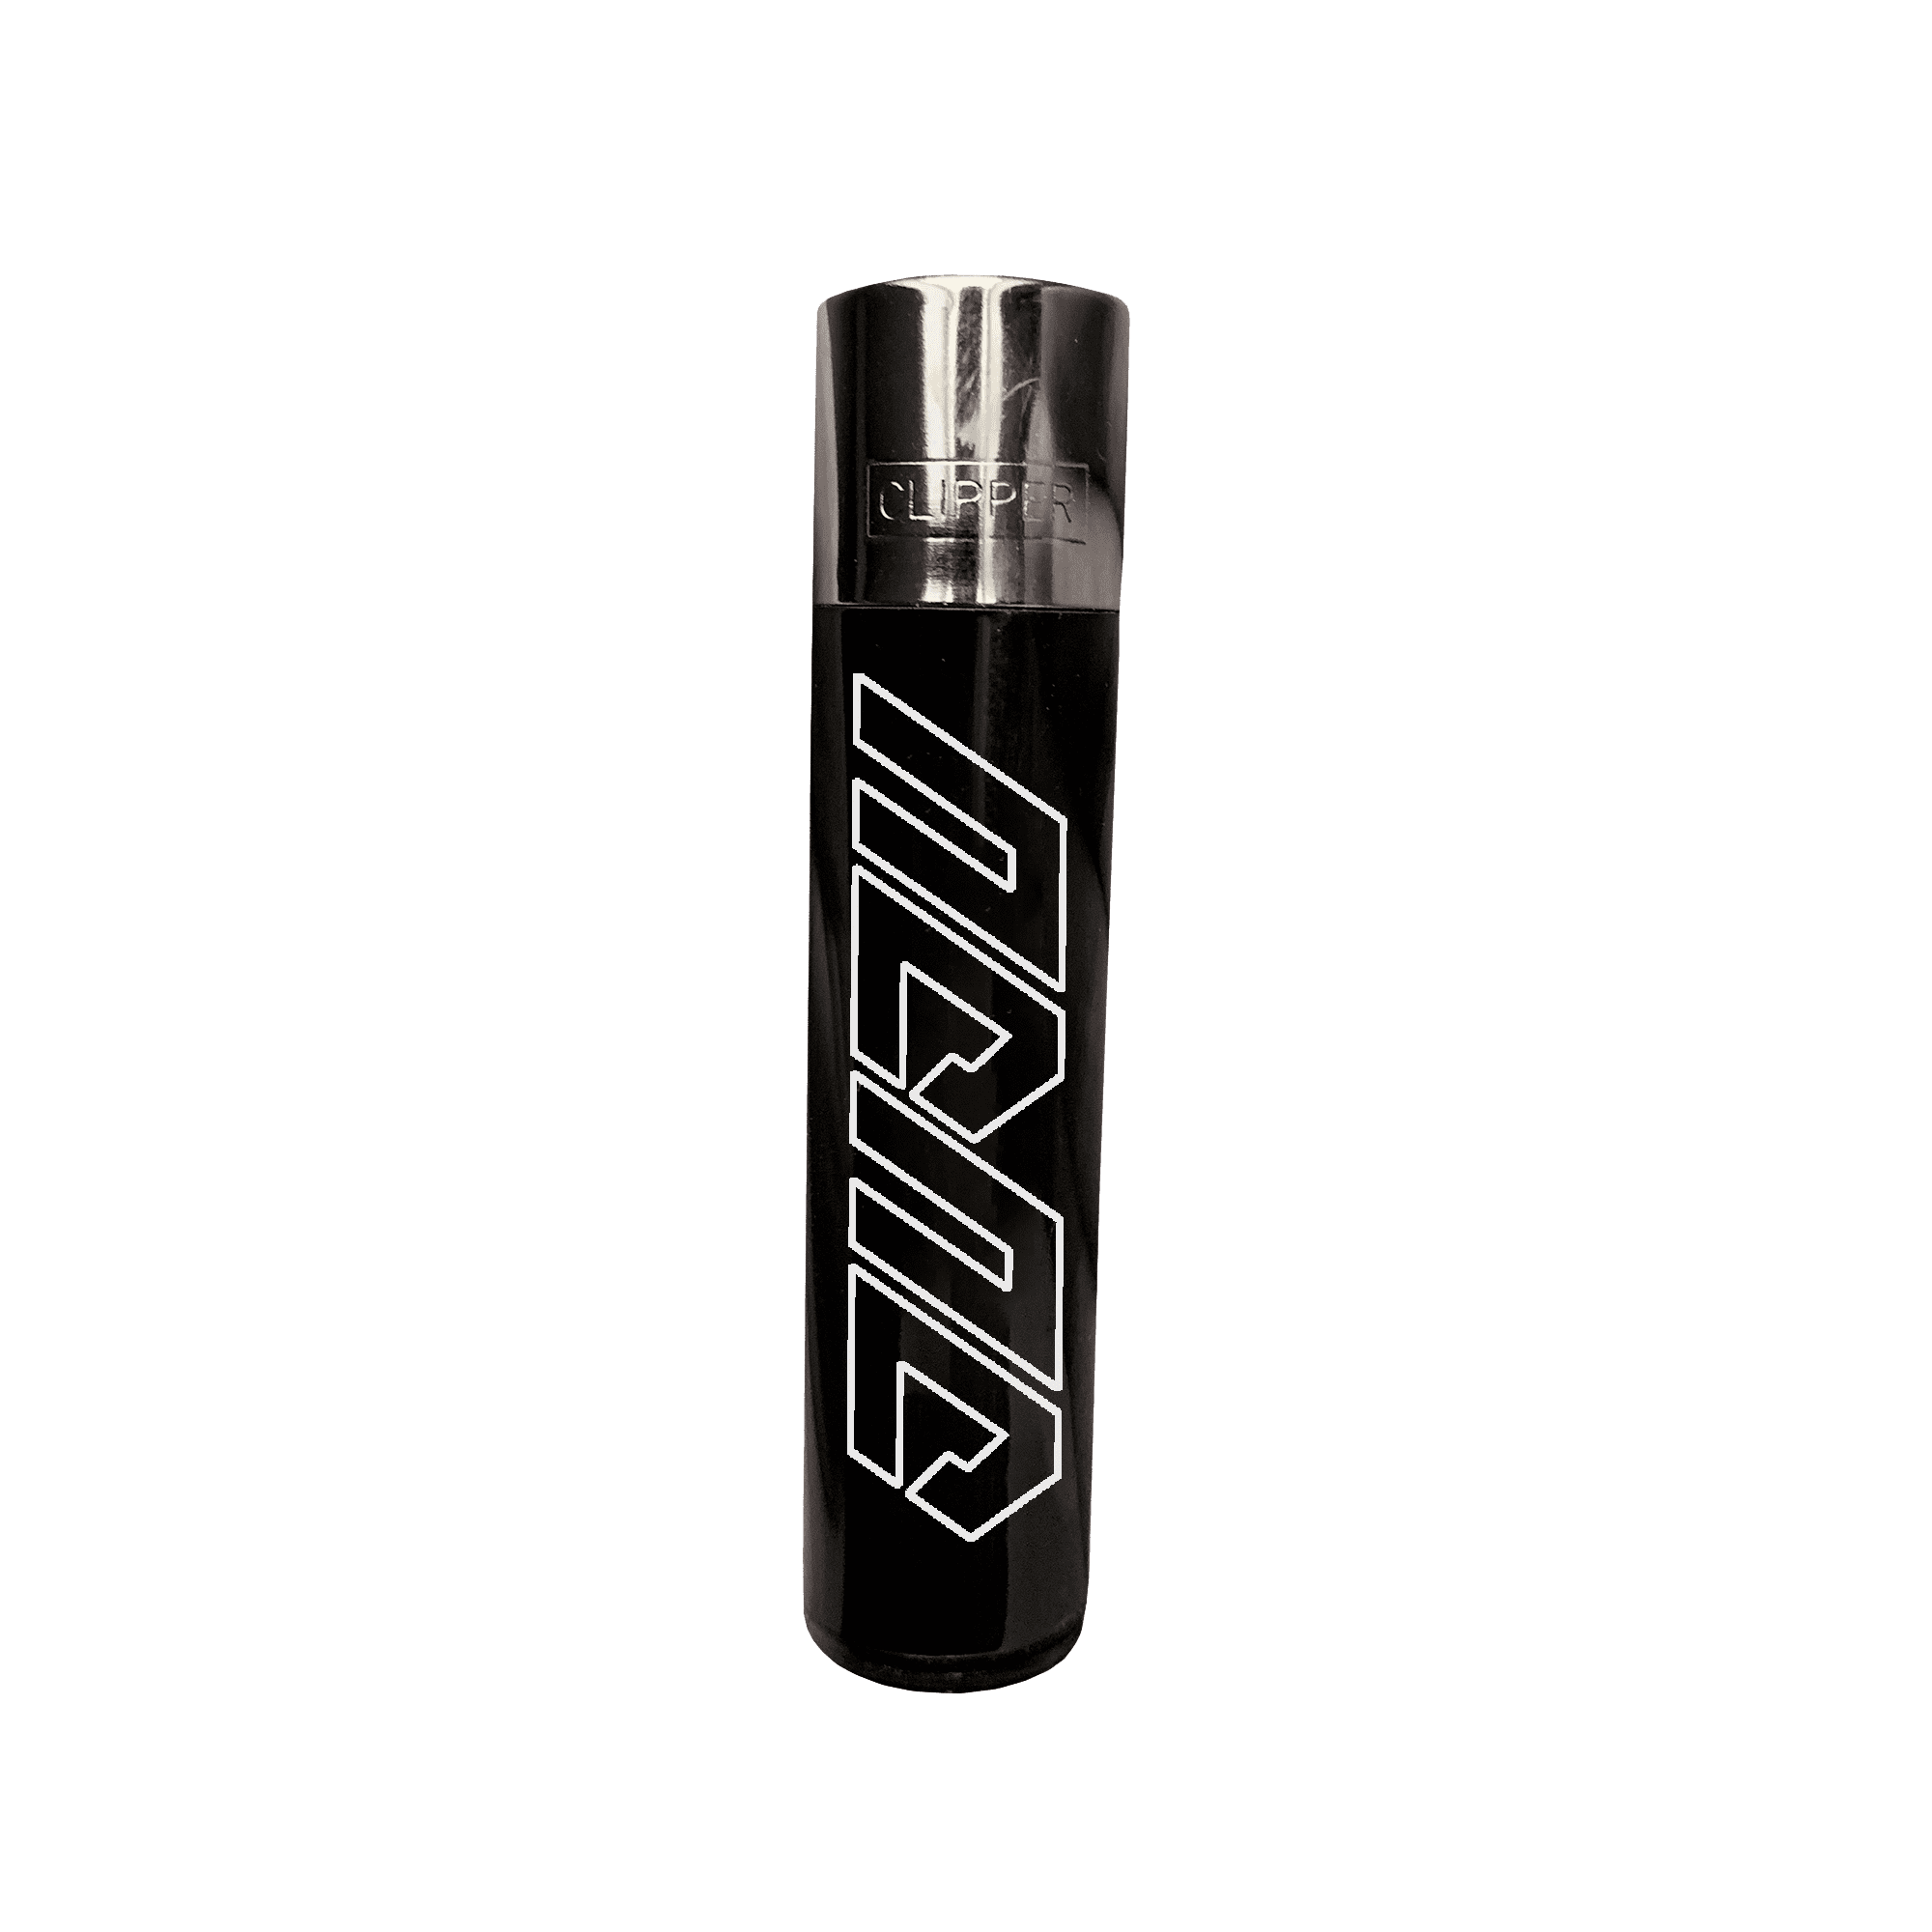 Juju-Feuerzeug-1_1_ (1)